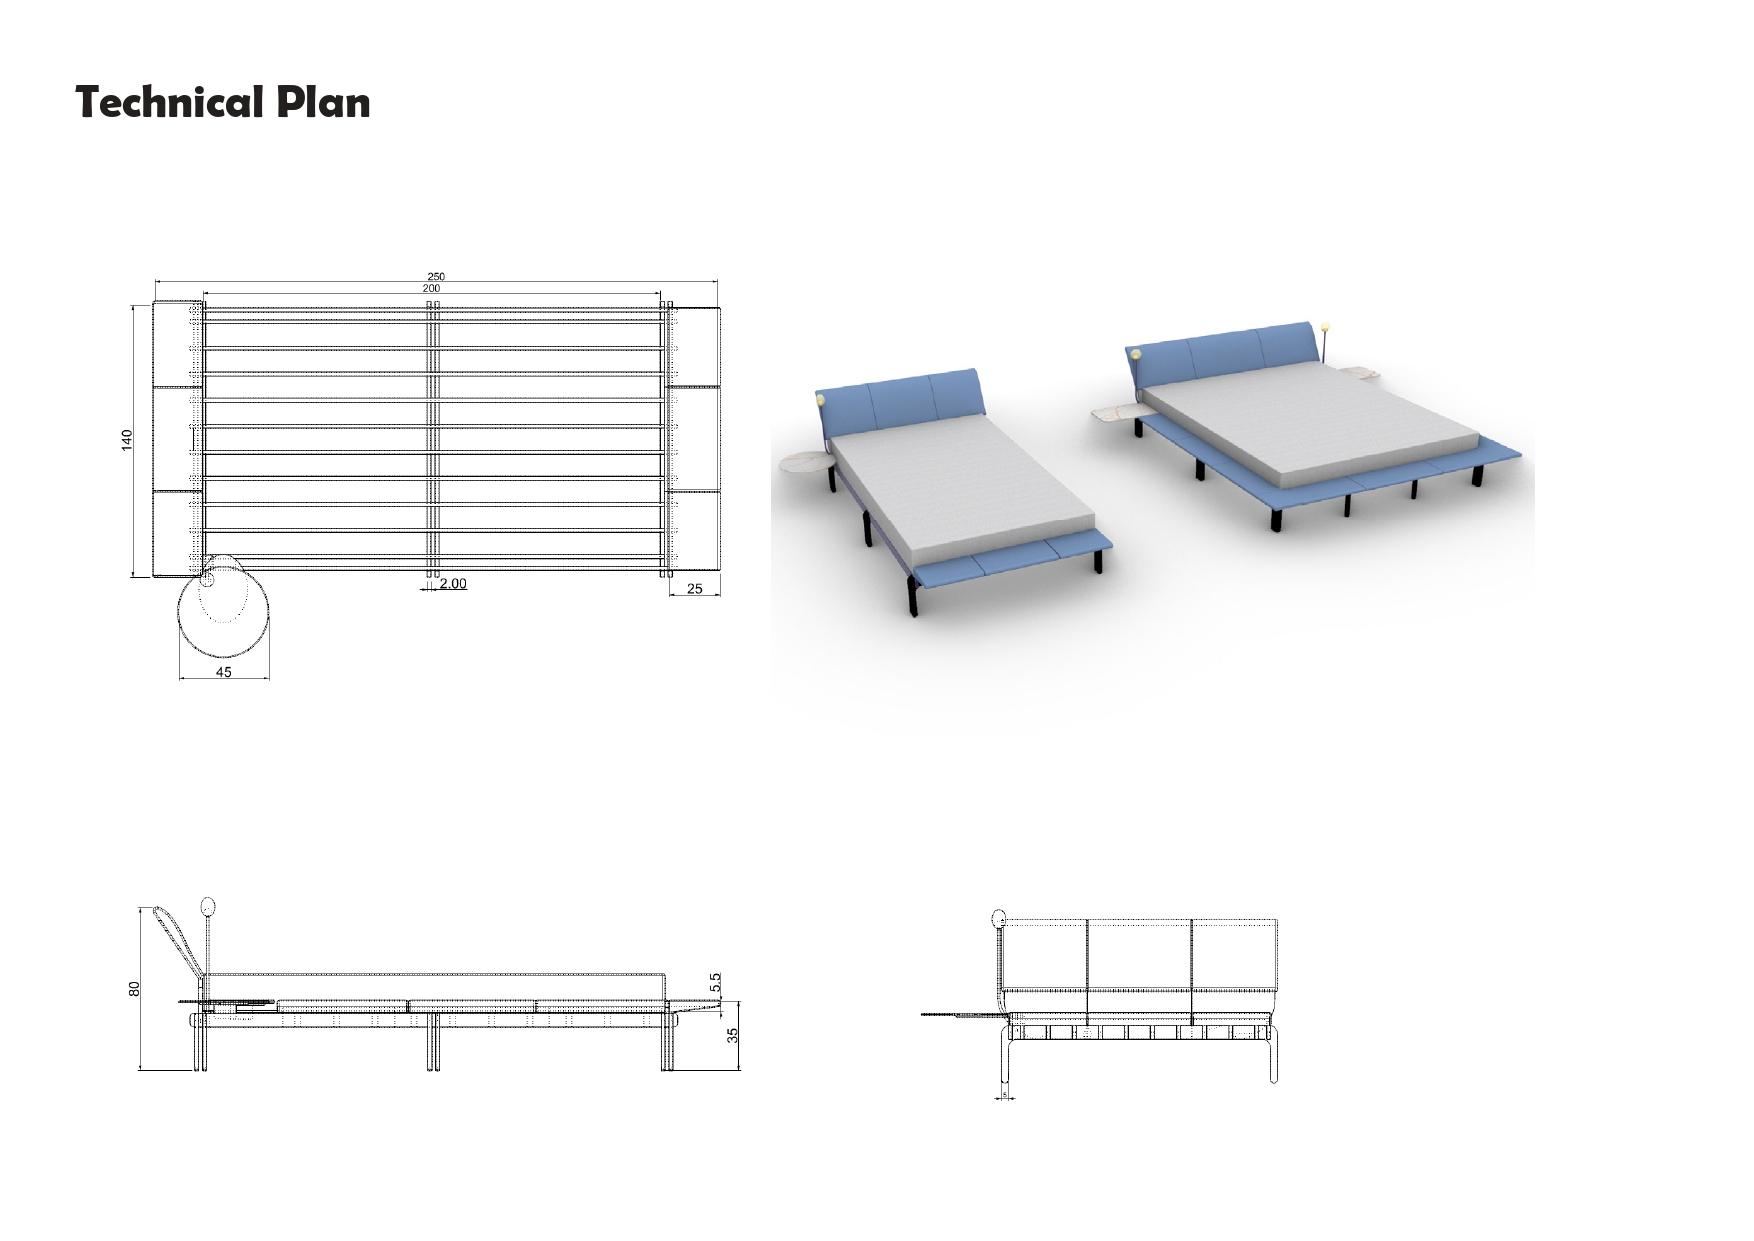 Livret Waffle modular-parametric Structure Dorian Vanhorenbeeck_page-0015